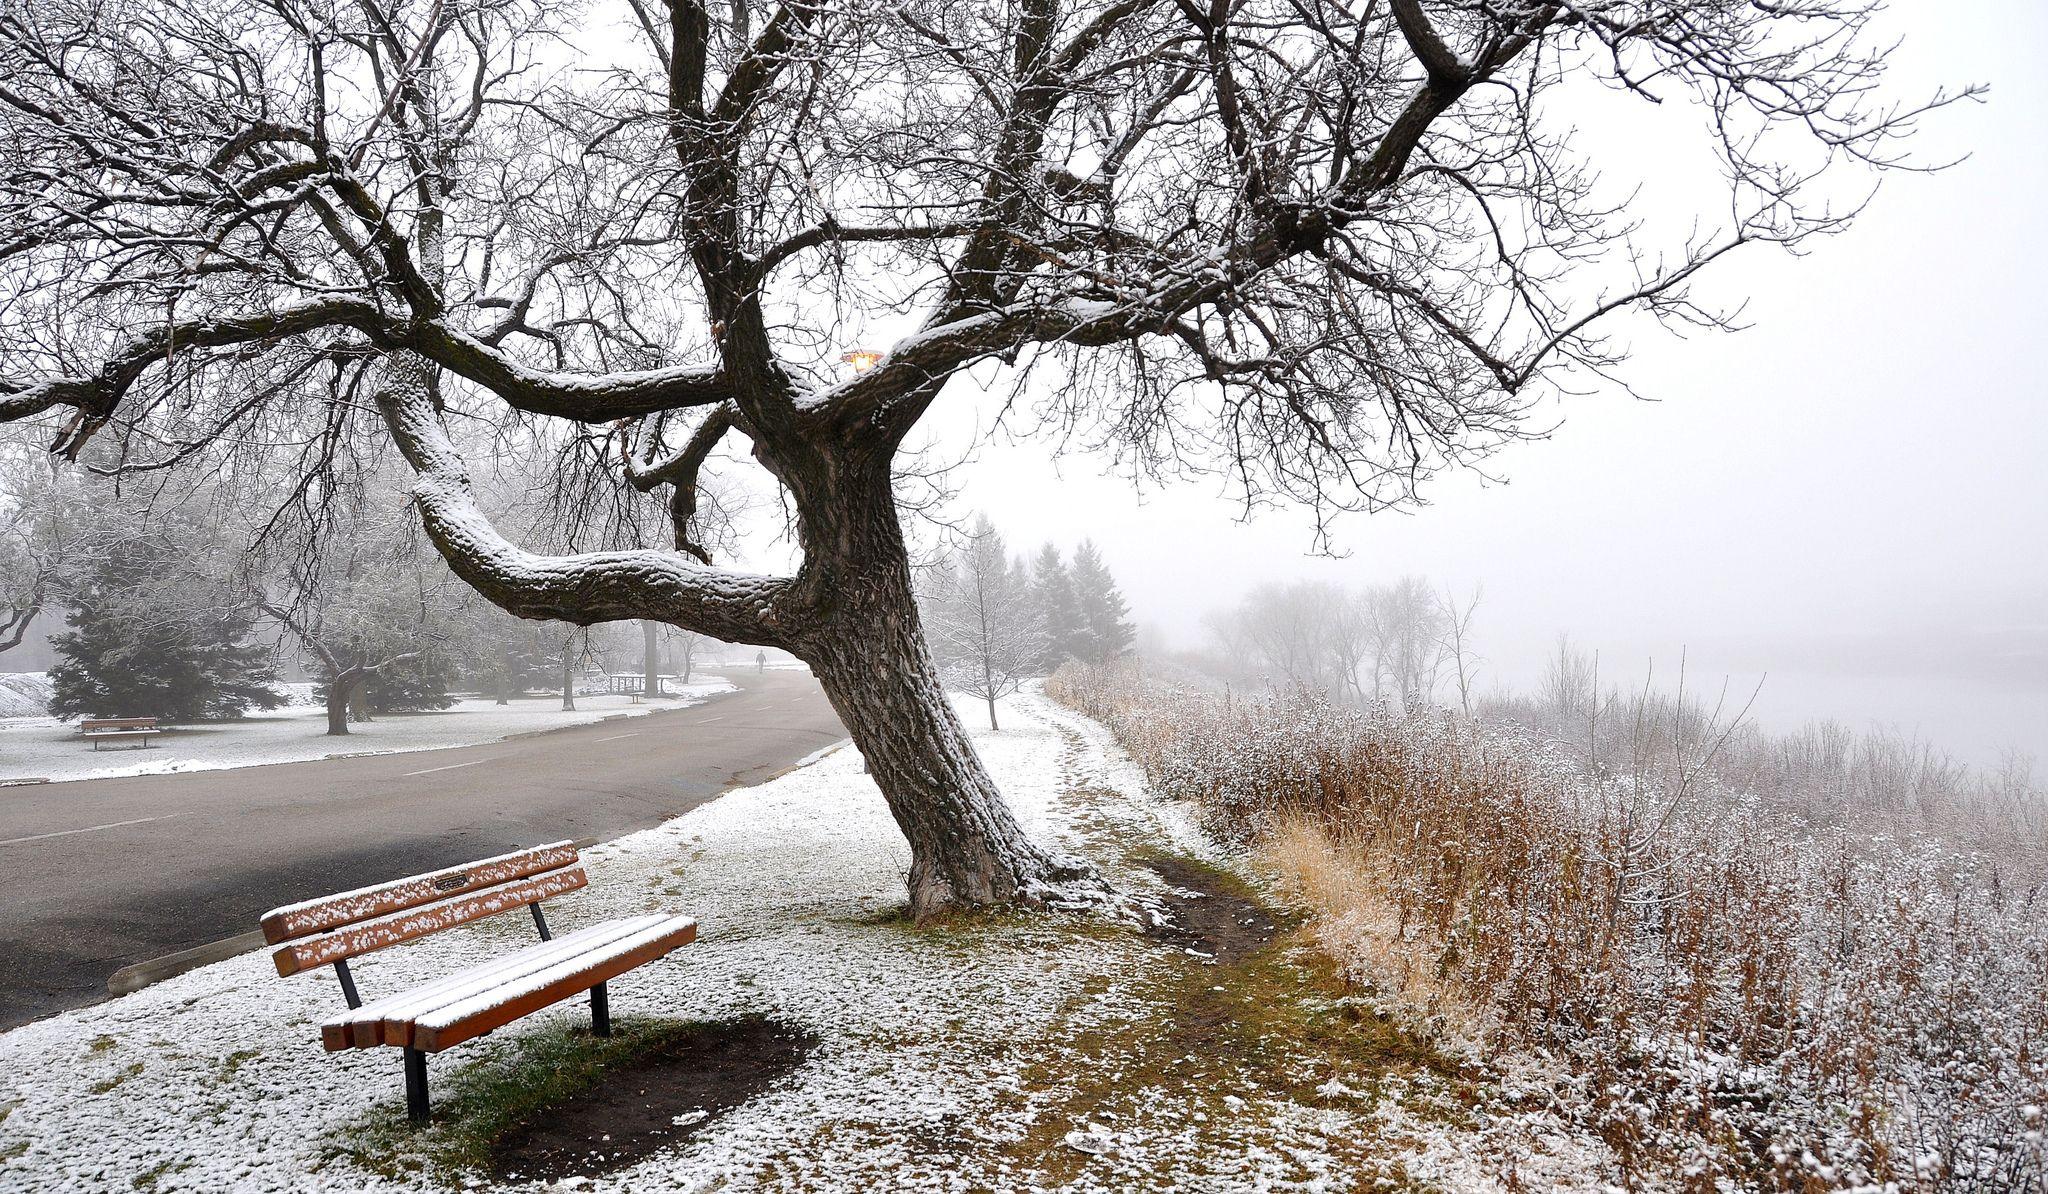 Когда ударило, картинки осень зима красивые пейзажи